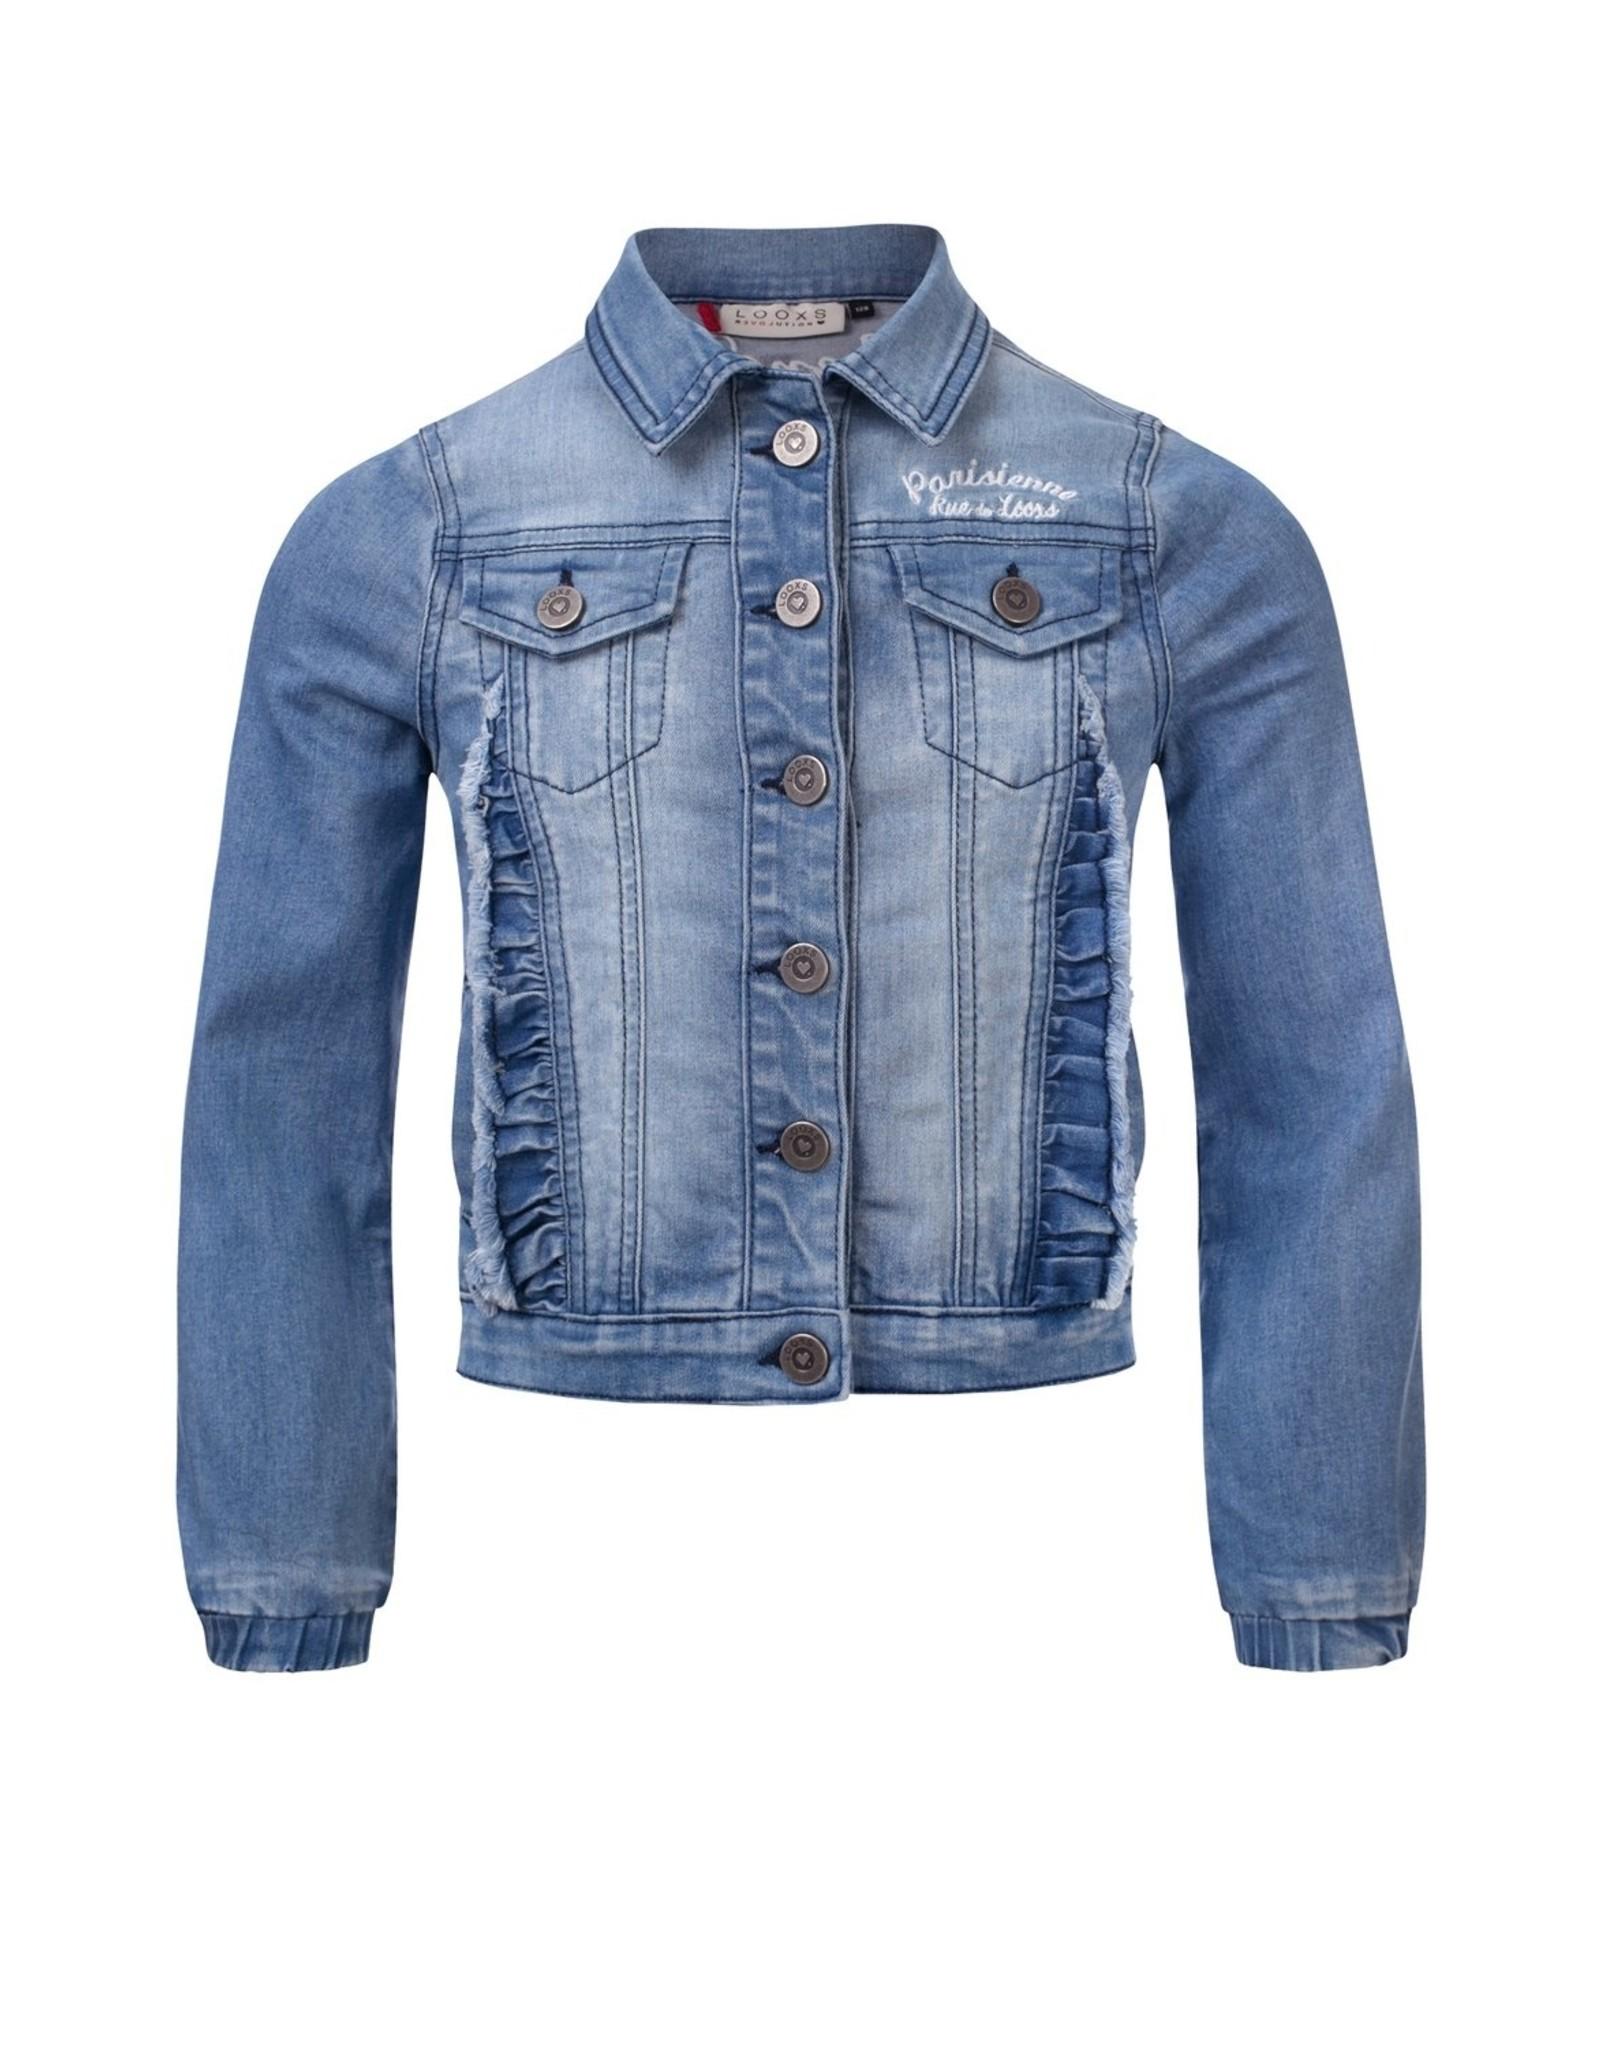 Looxs Revolution Girls denim jacket